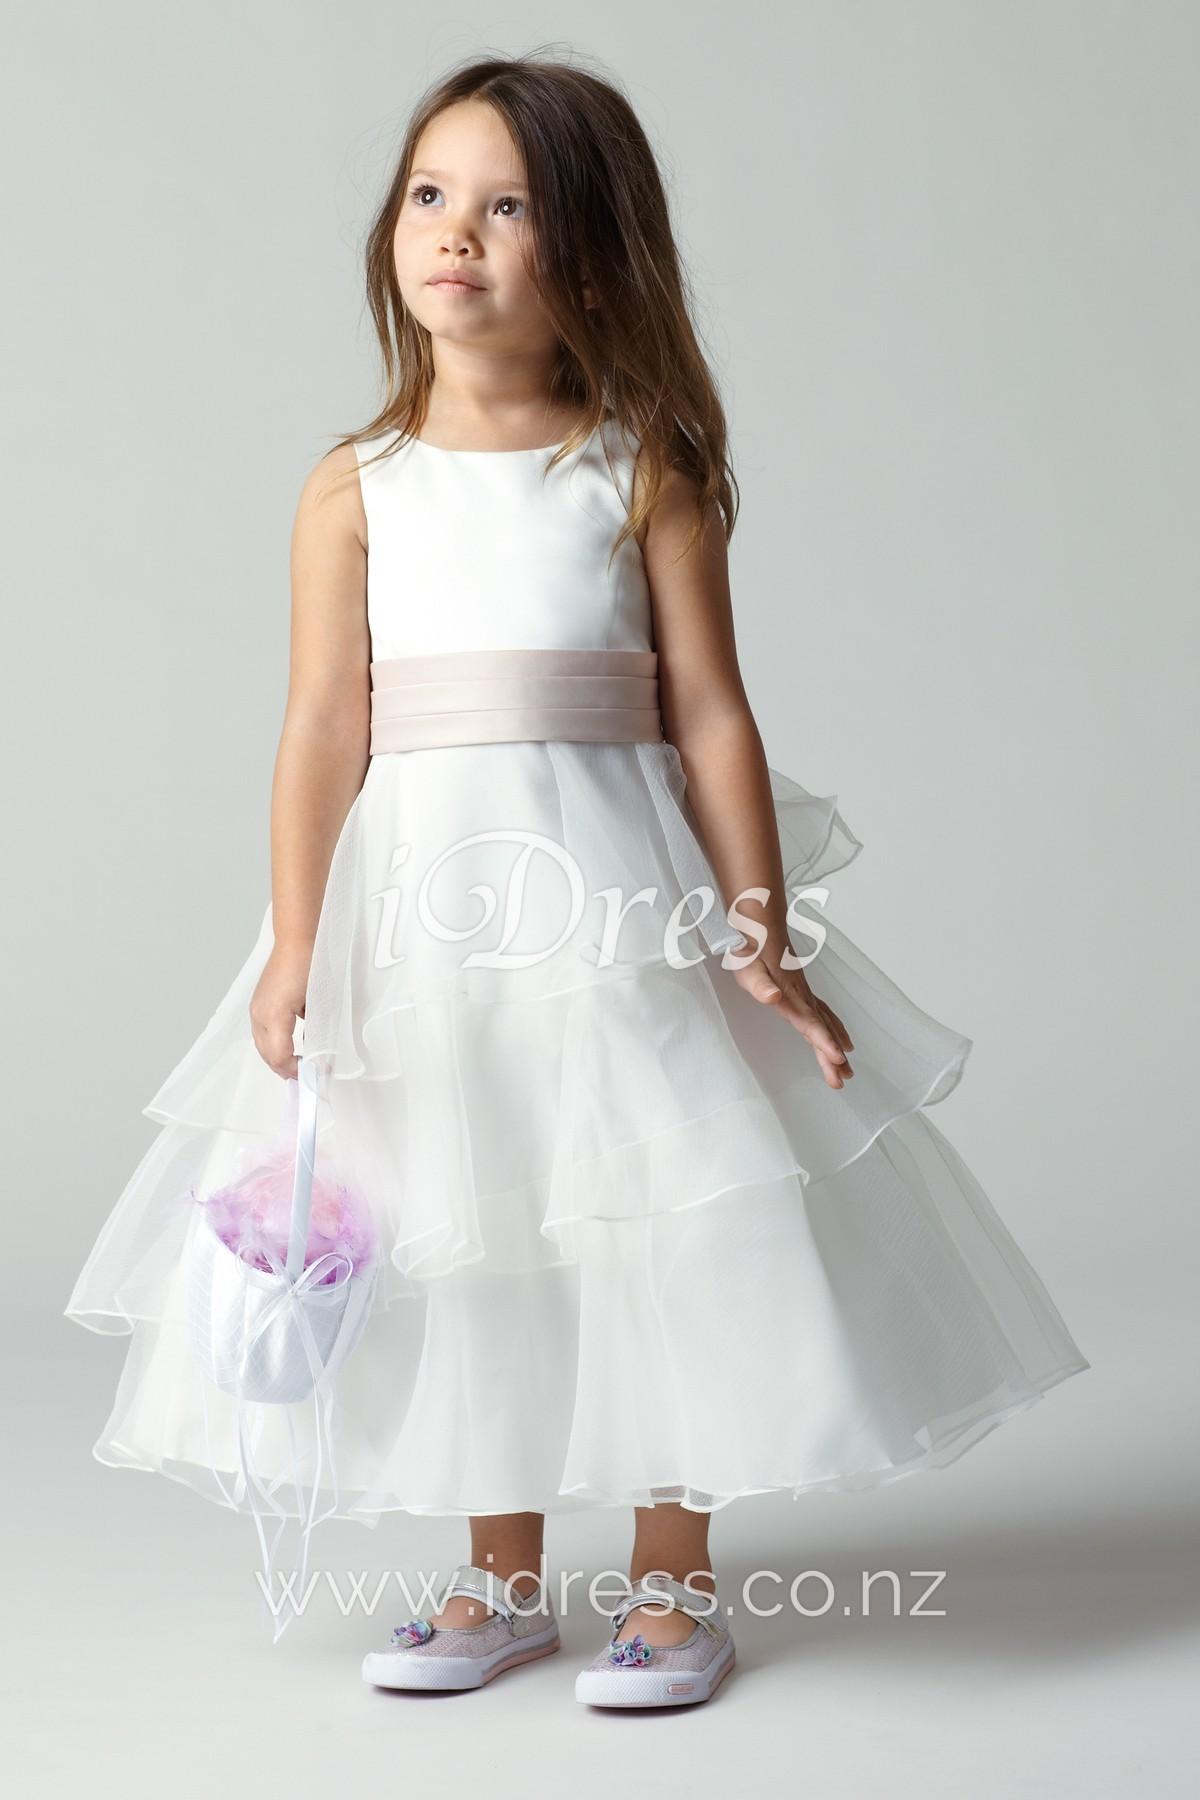 Tiered Tea Length Sleeveless Boat Neck A-line Flower Girl Dress - iDress